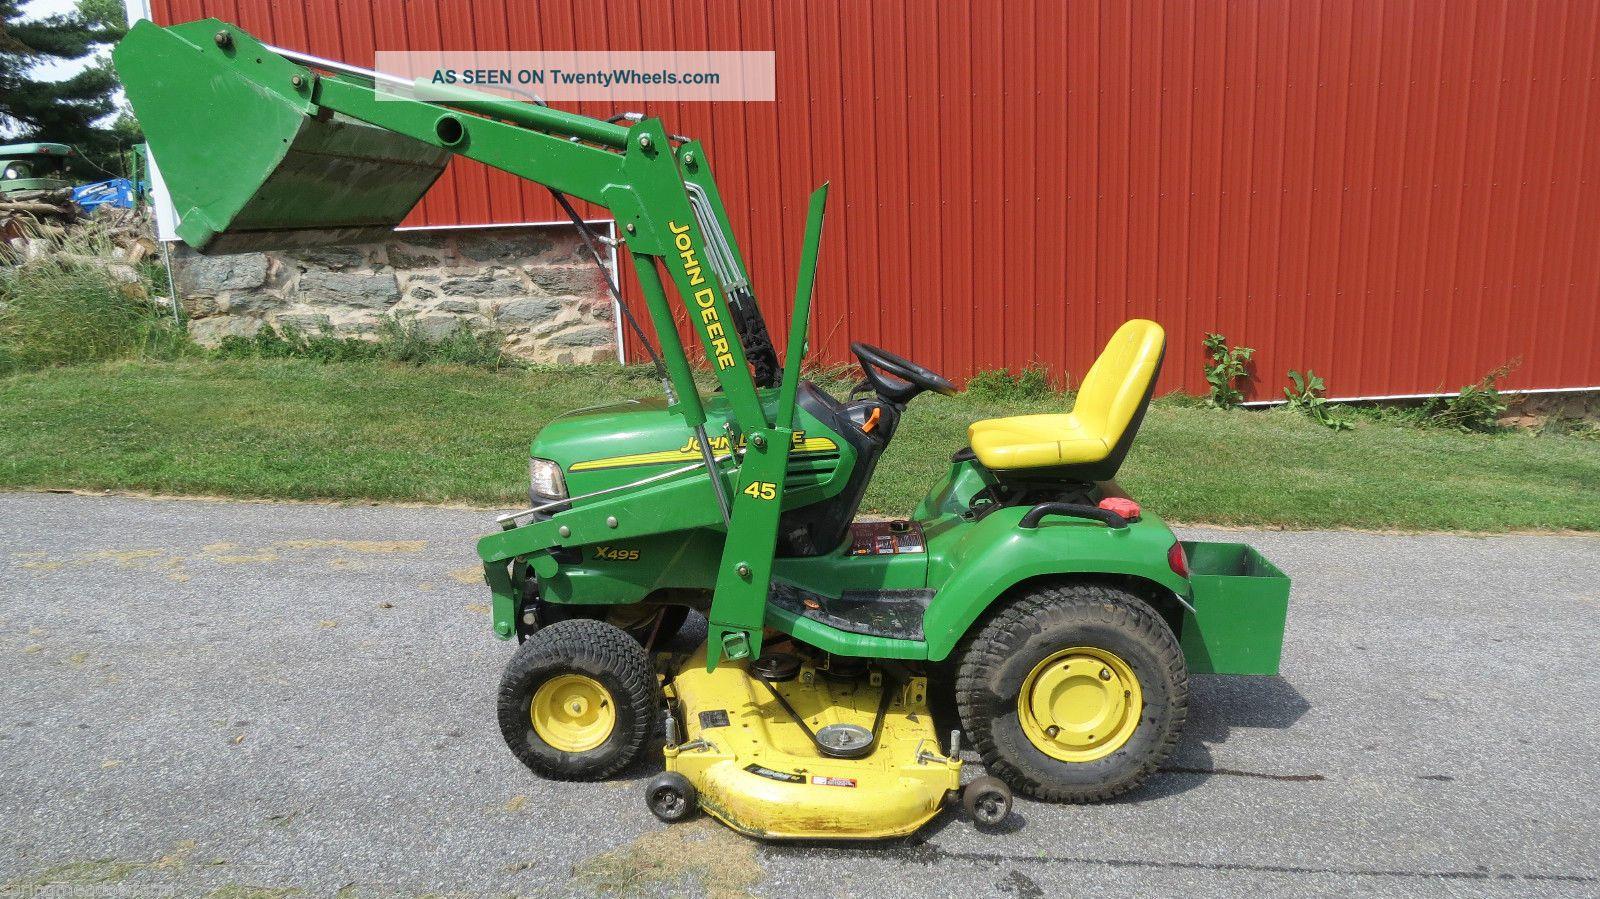 2004 John Deere X495 Garden Tractor W/ Loader Belly Mower ...